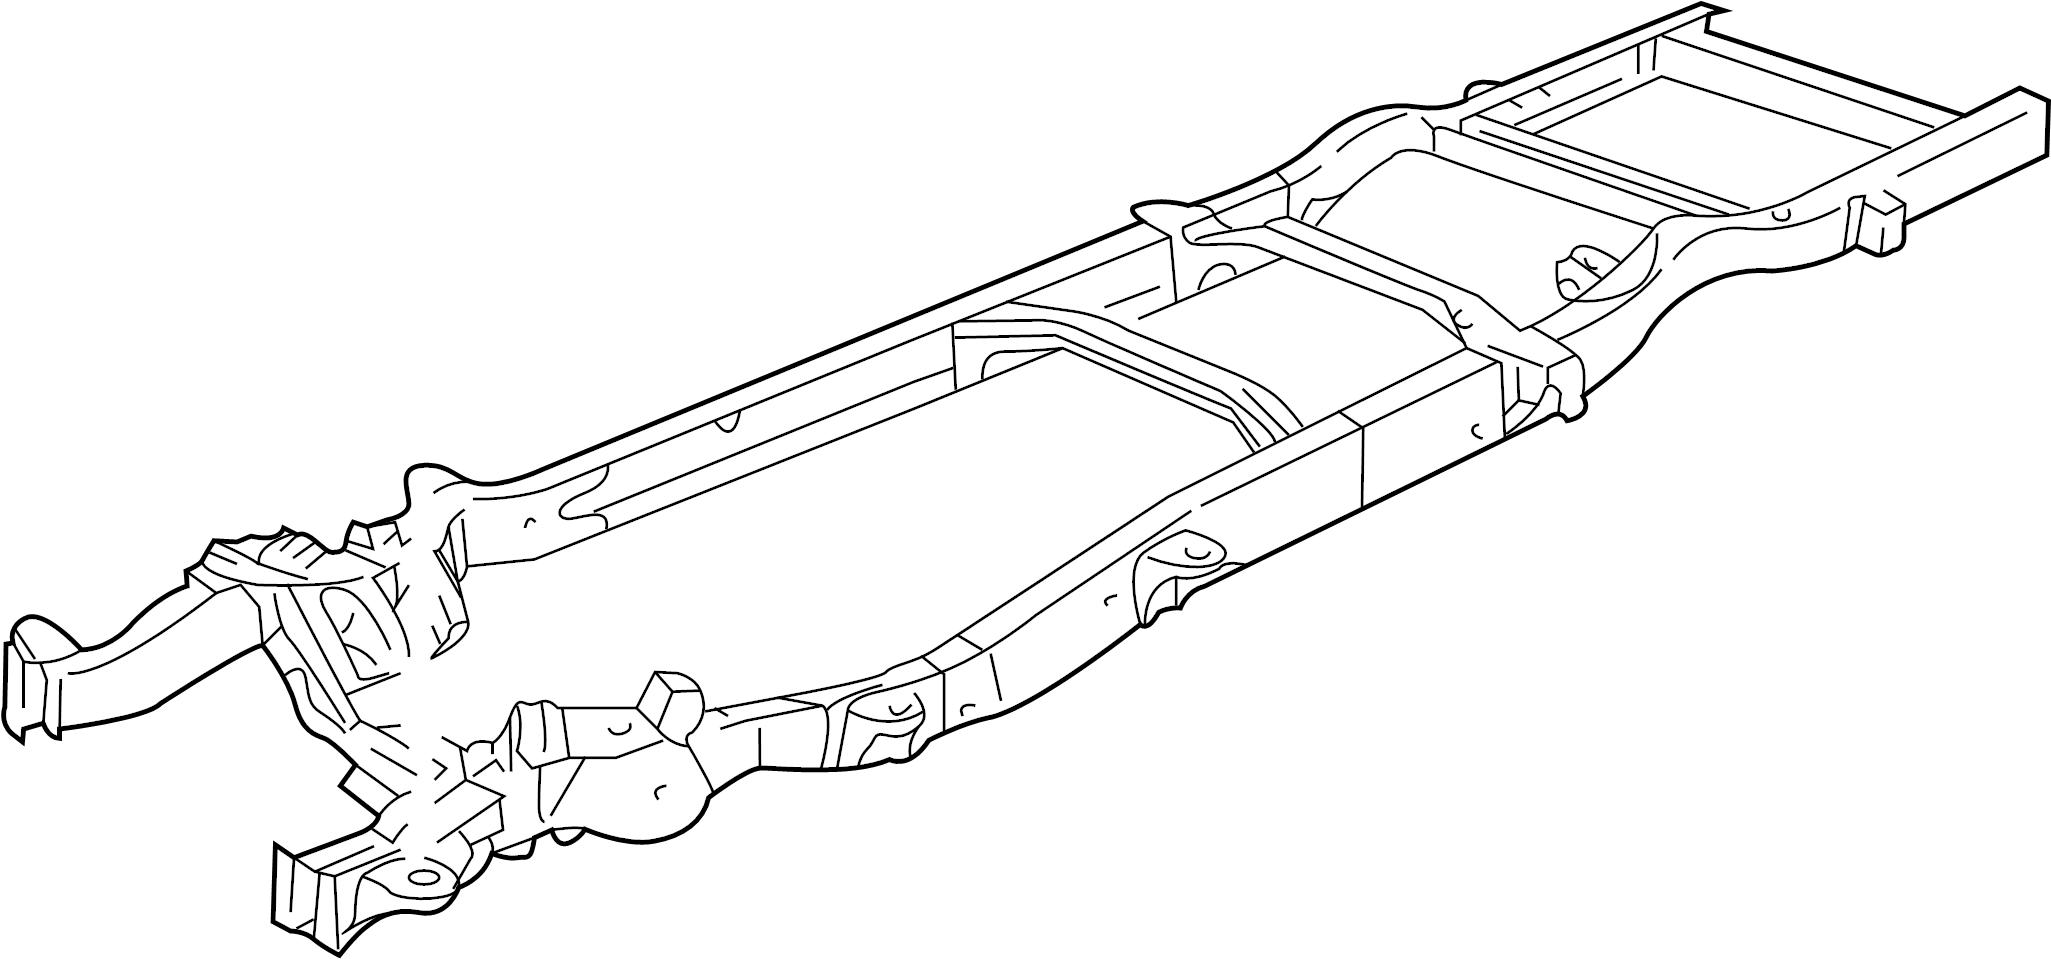 GMC Savana 2500 Frame Rail. All, long wheelbase, w/o